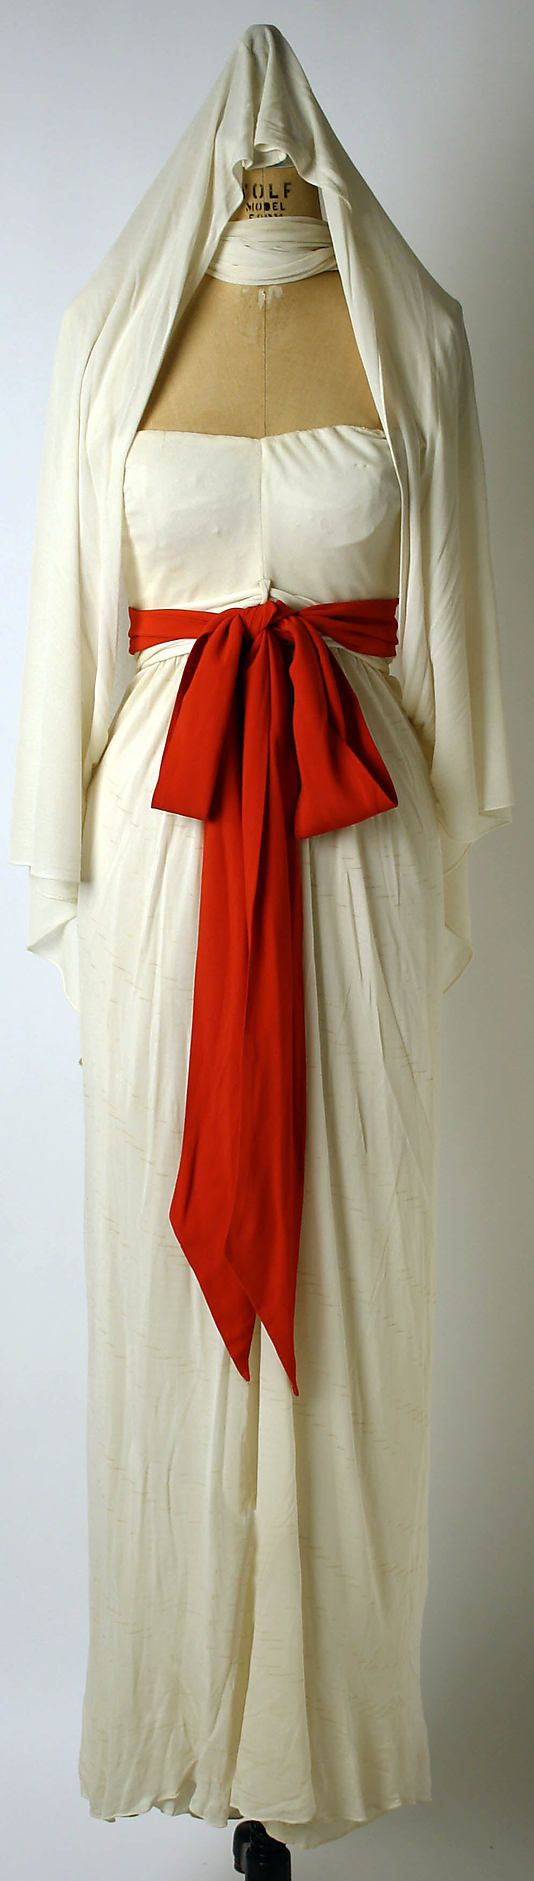 Evening Dress, Evening Gown, Splendid Evening Dress Design, Fashion Designer, Evening Dress Designer, Miracle Gown    Valentina (American, born Russia, 1899–1989)  Date: 1945 Culture: American Medium: silk